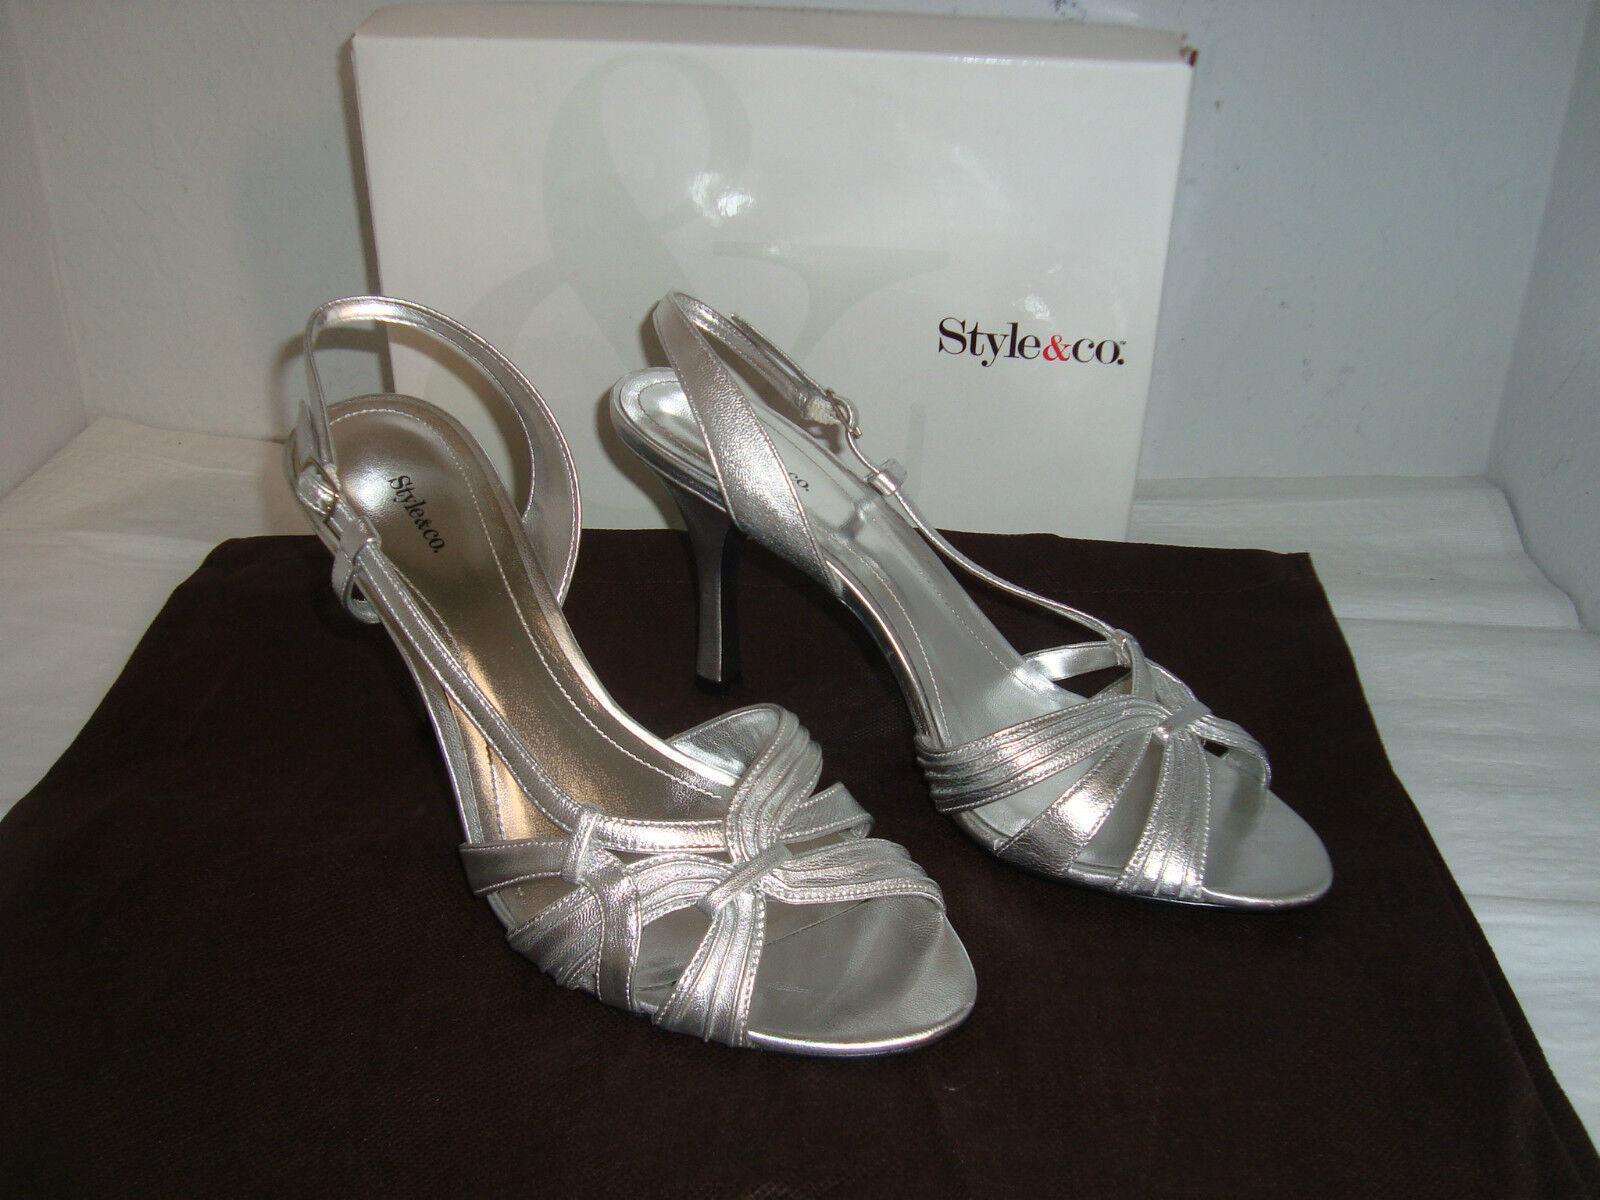 NEU Style & Co Lafay Silver Sandales 9 Medium Schuhes